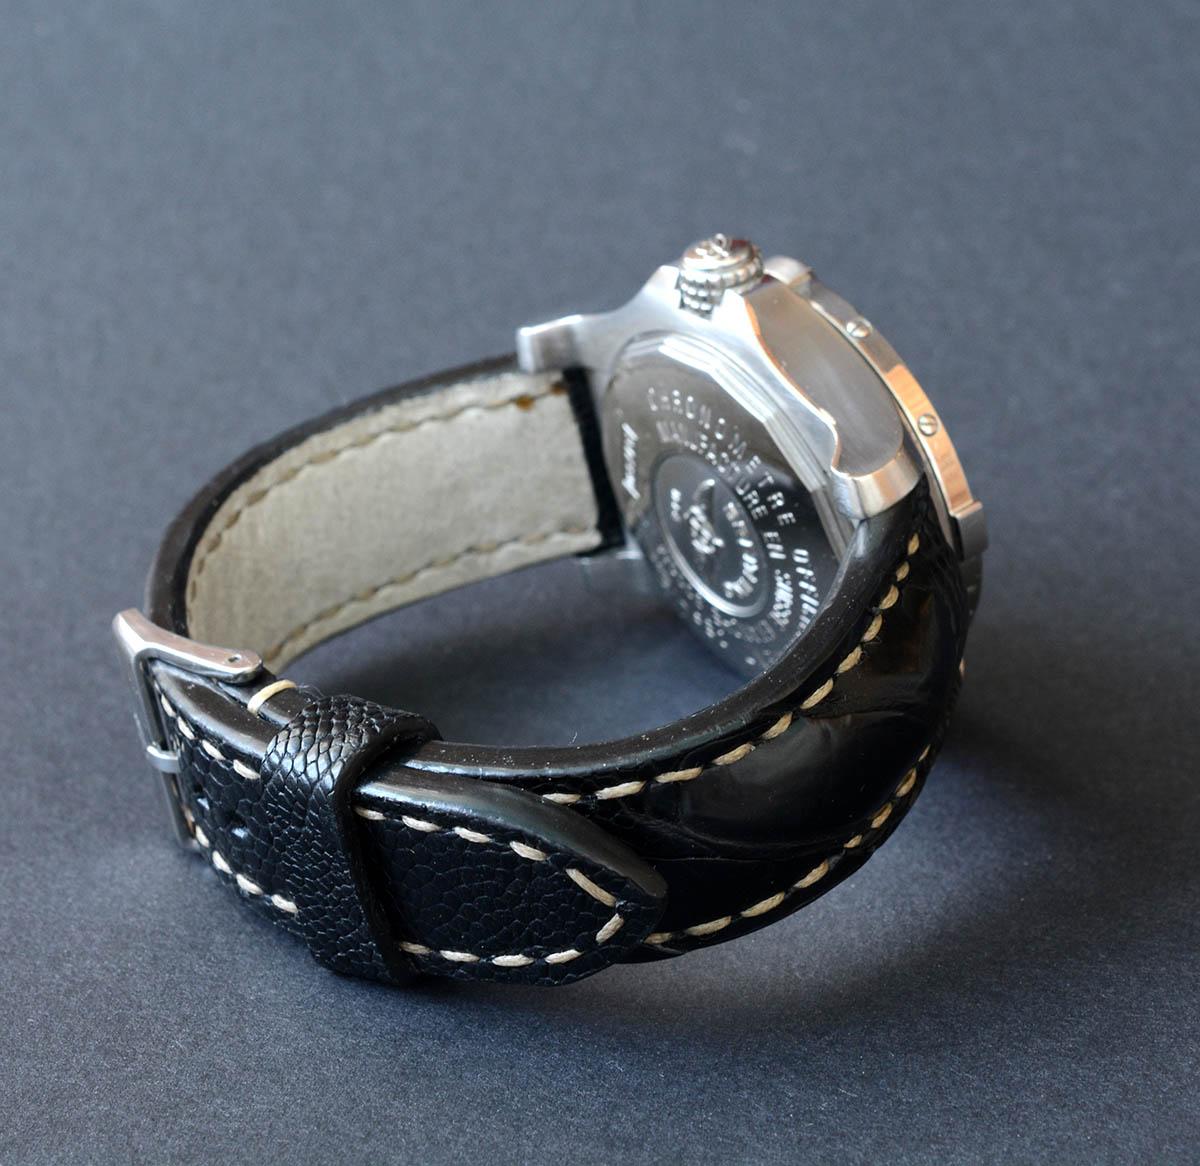 Name:  Breitling_Watch_Strap_Vladstraps-2.JPG Views: 30 Size:  186.9 KB